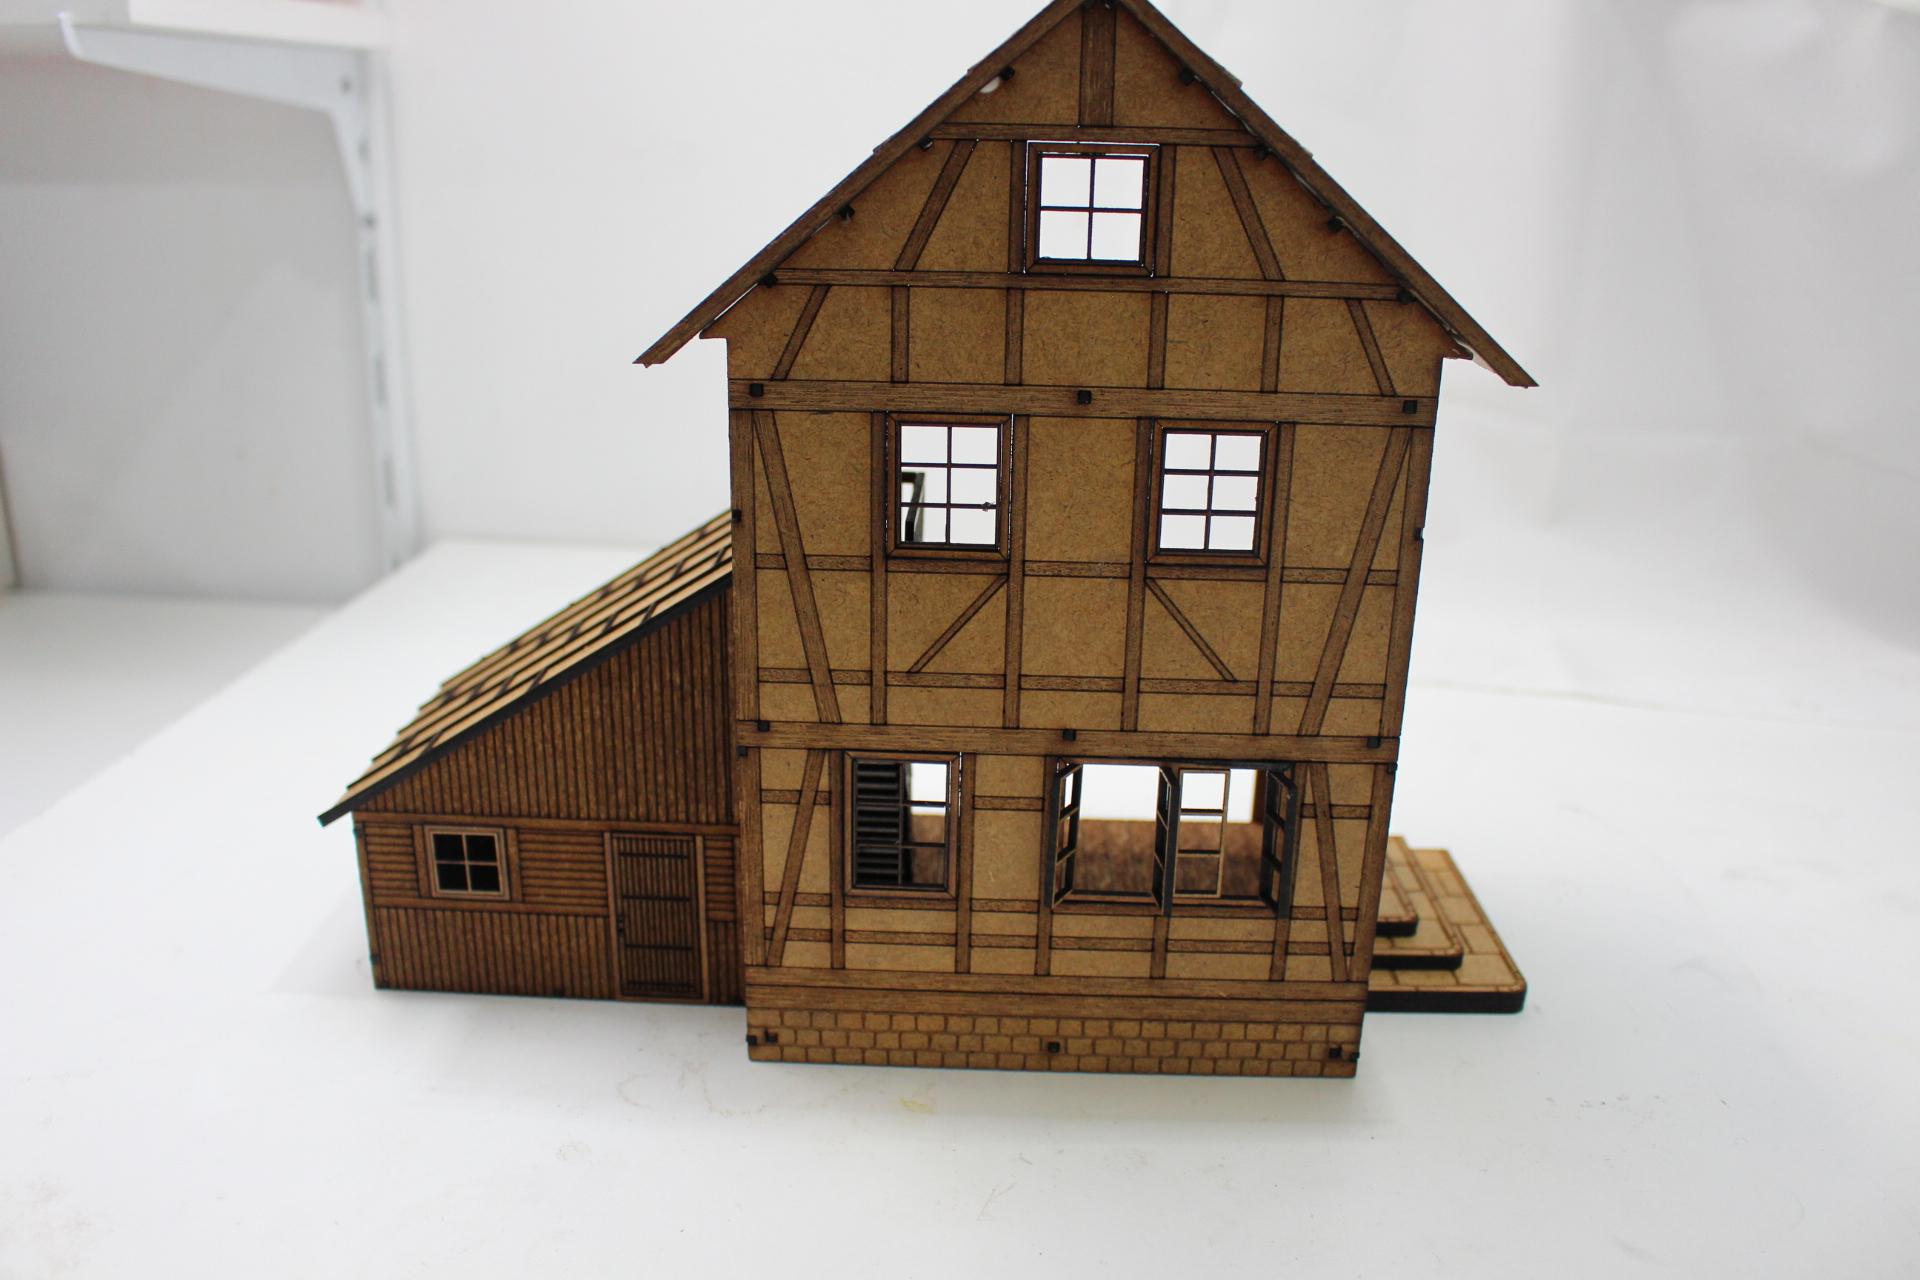 Bild-01 Fachwerkhaus mit Holzschuppen - Lasercut Modellbaushop 1:35